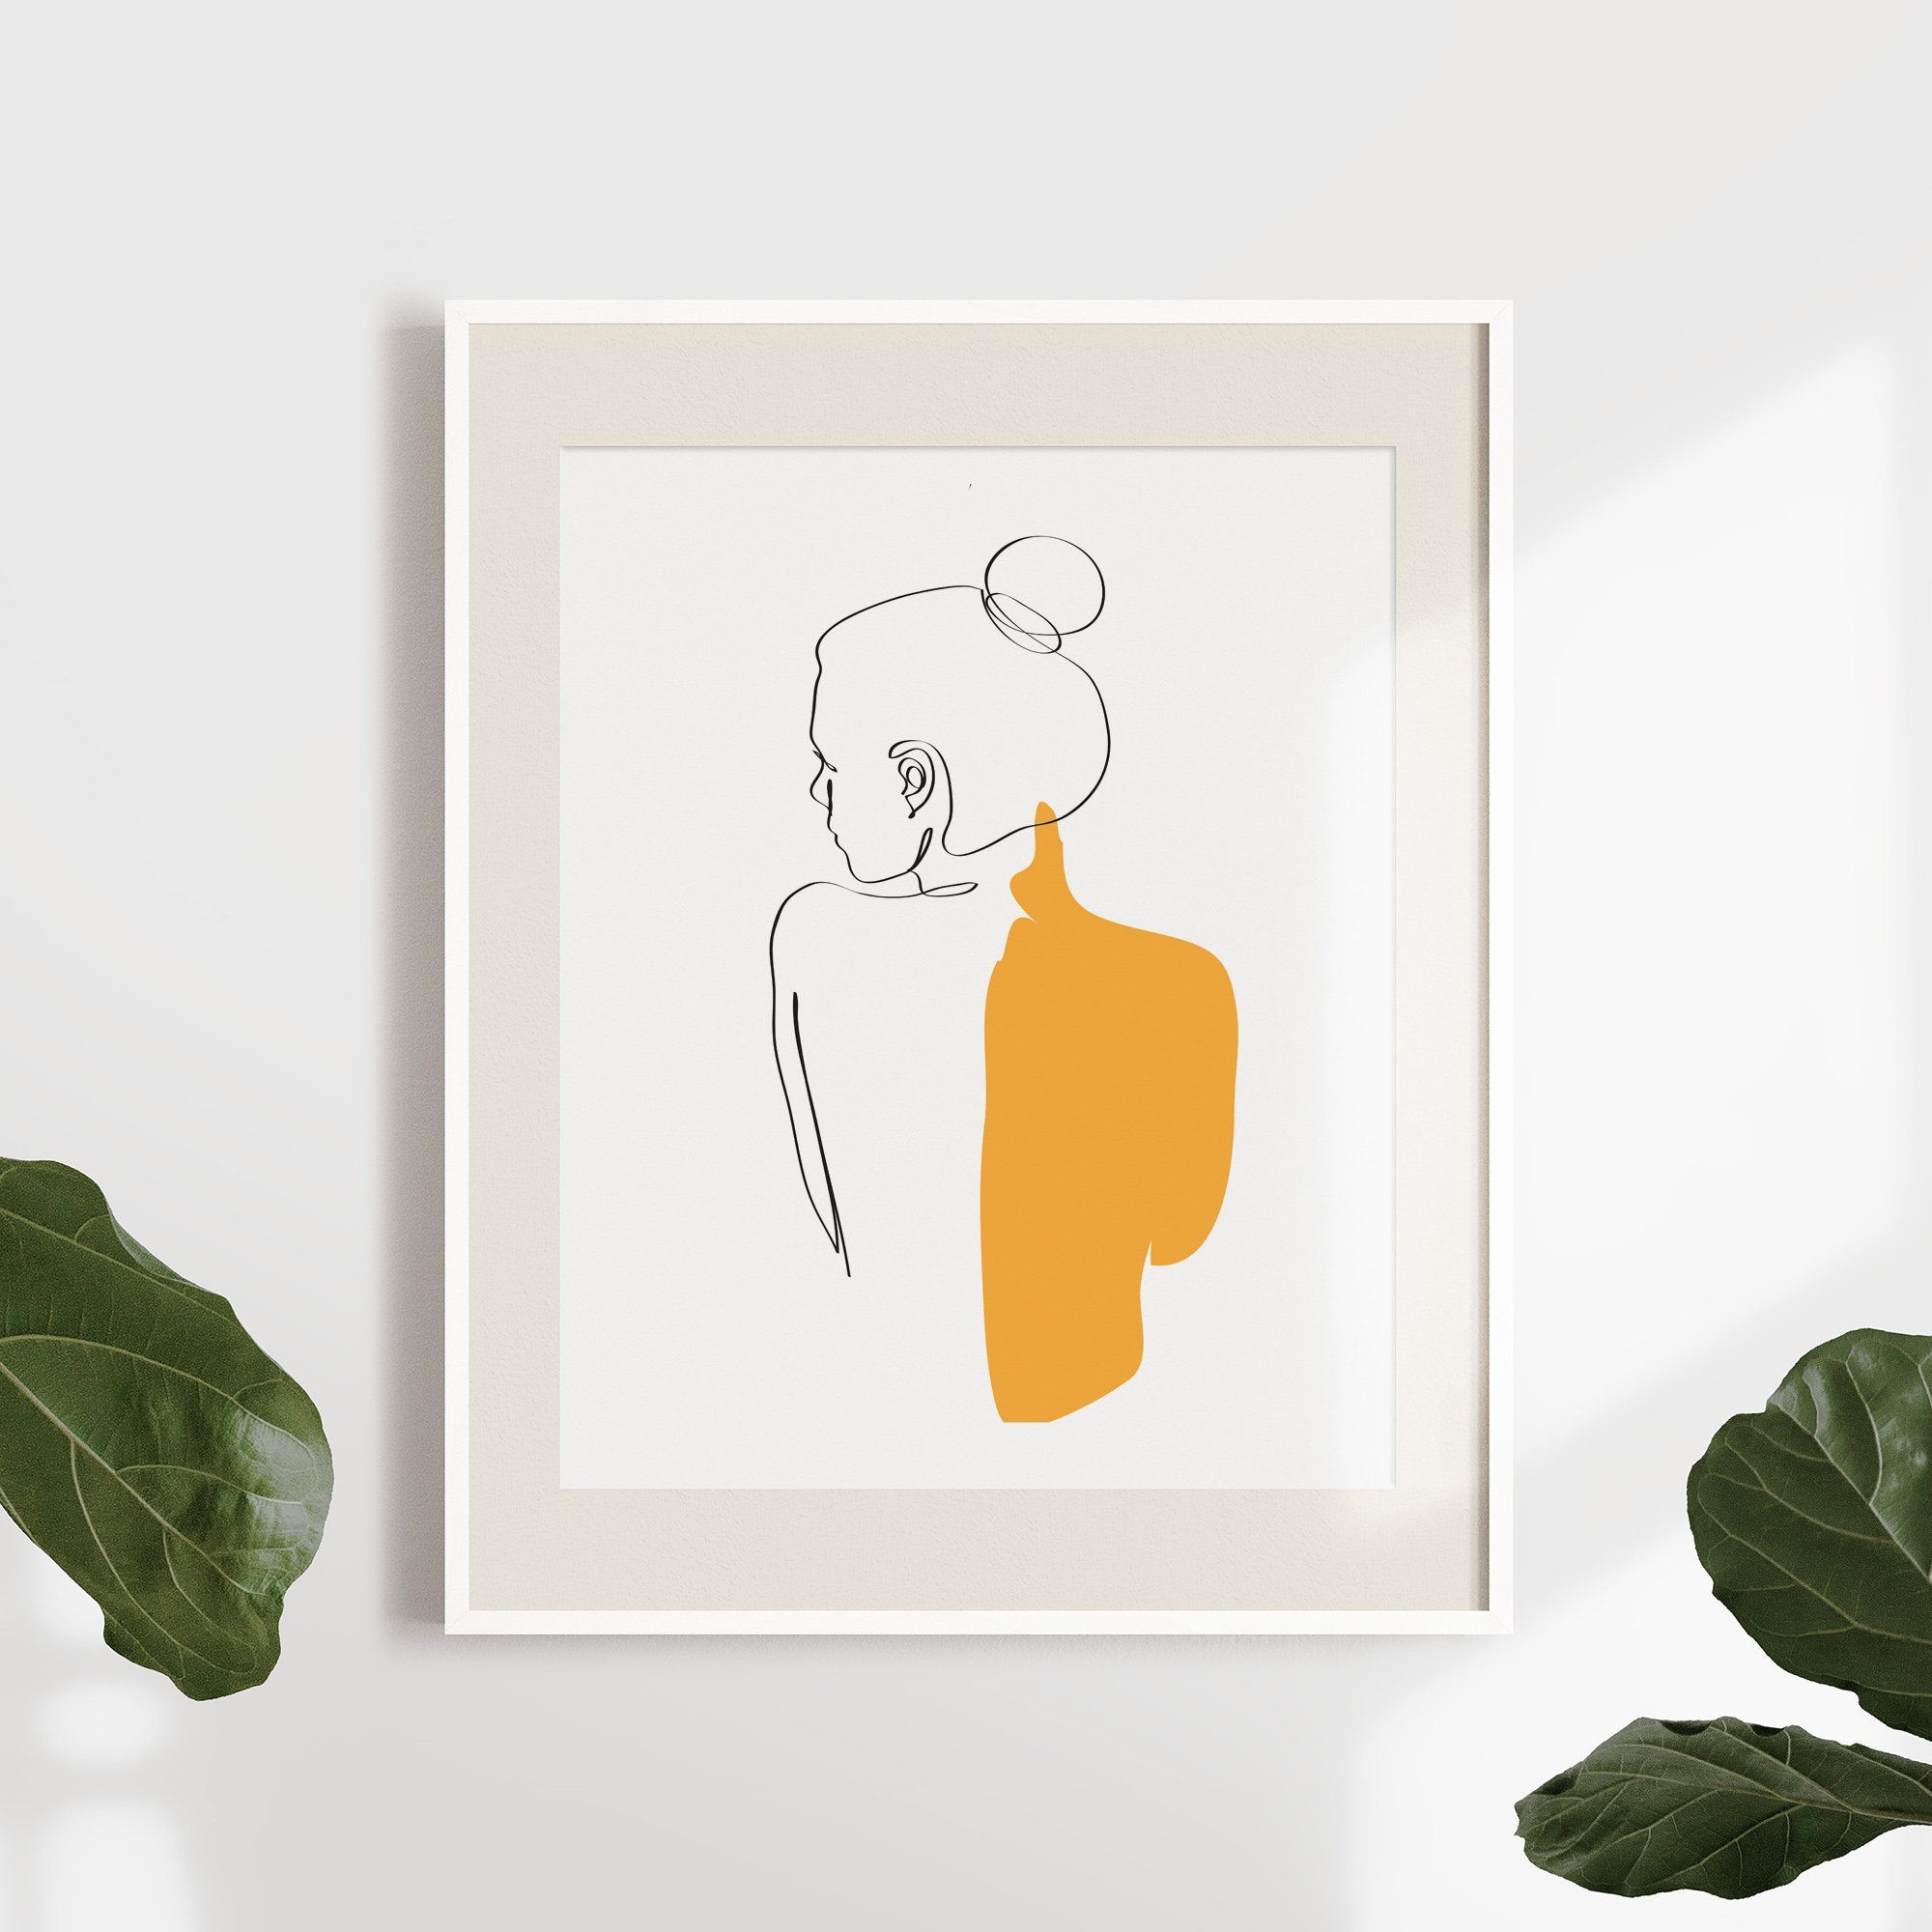 Abstract One-Line Feminine Figure Printable, Minimalist Nude Woman Body From Back Art, Fine Naked Prints, Illustration Poster, Digital Print